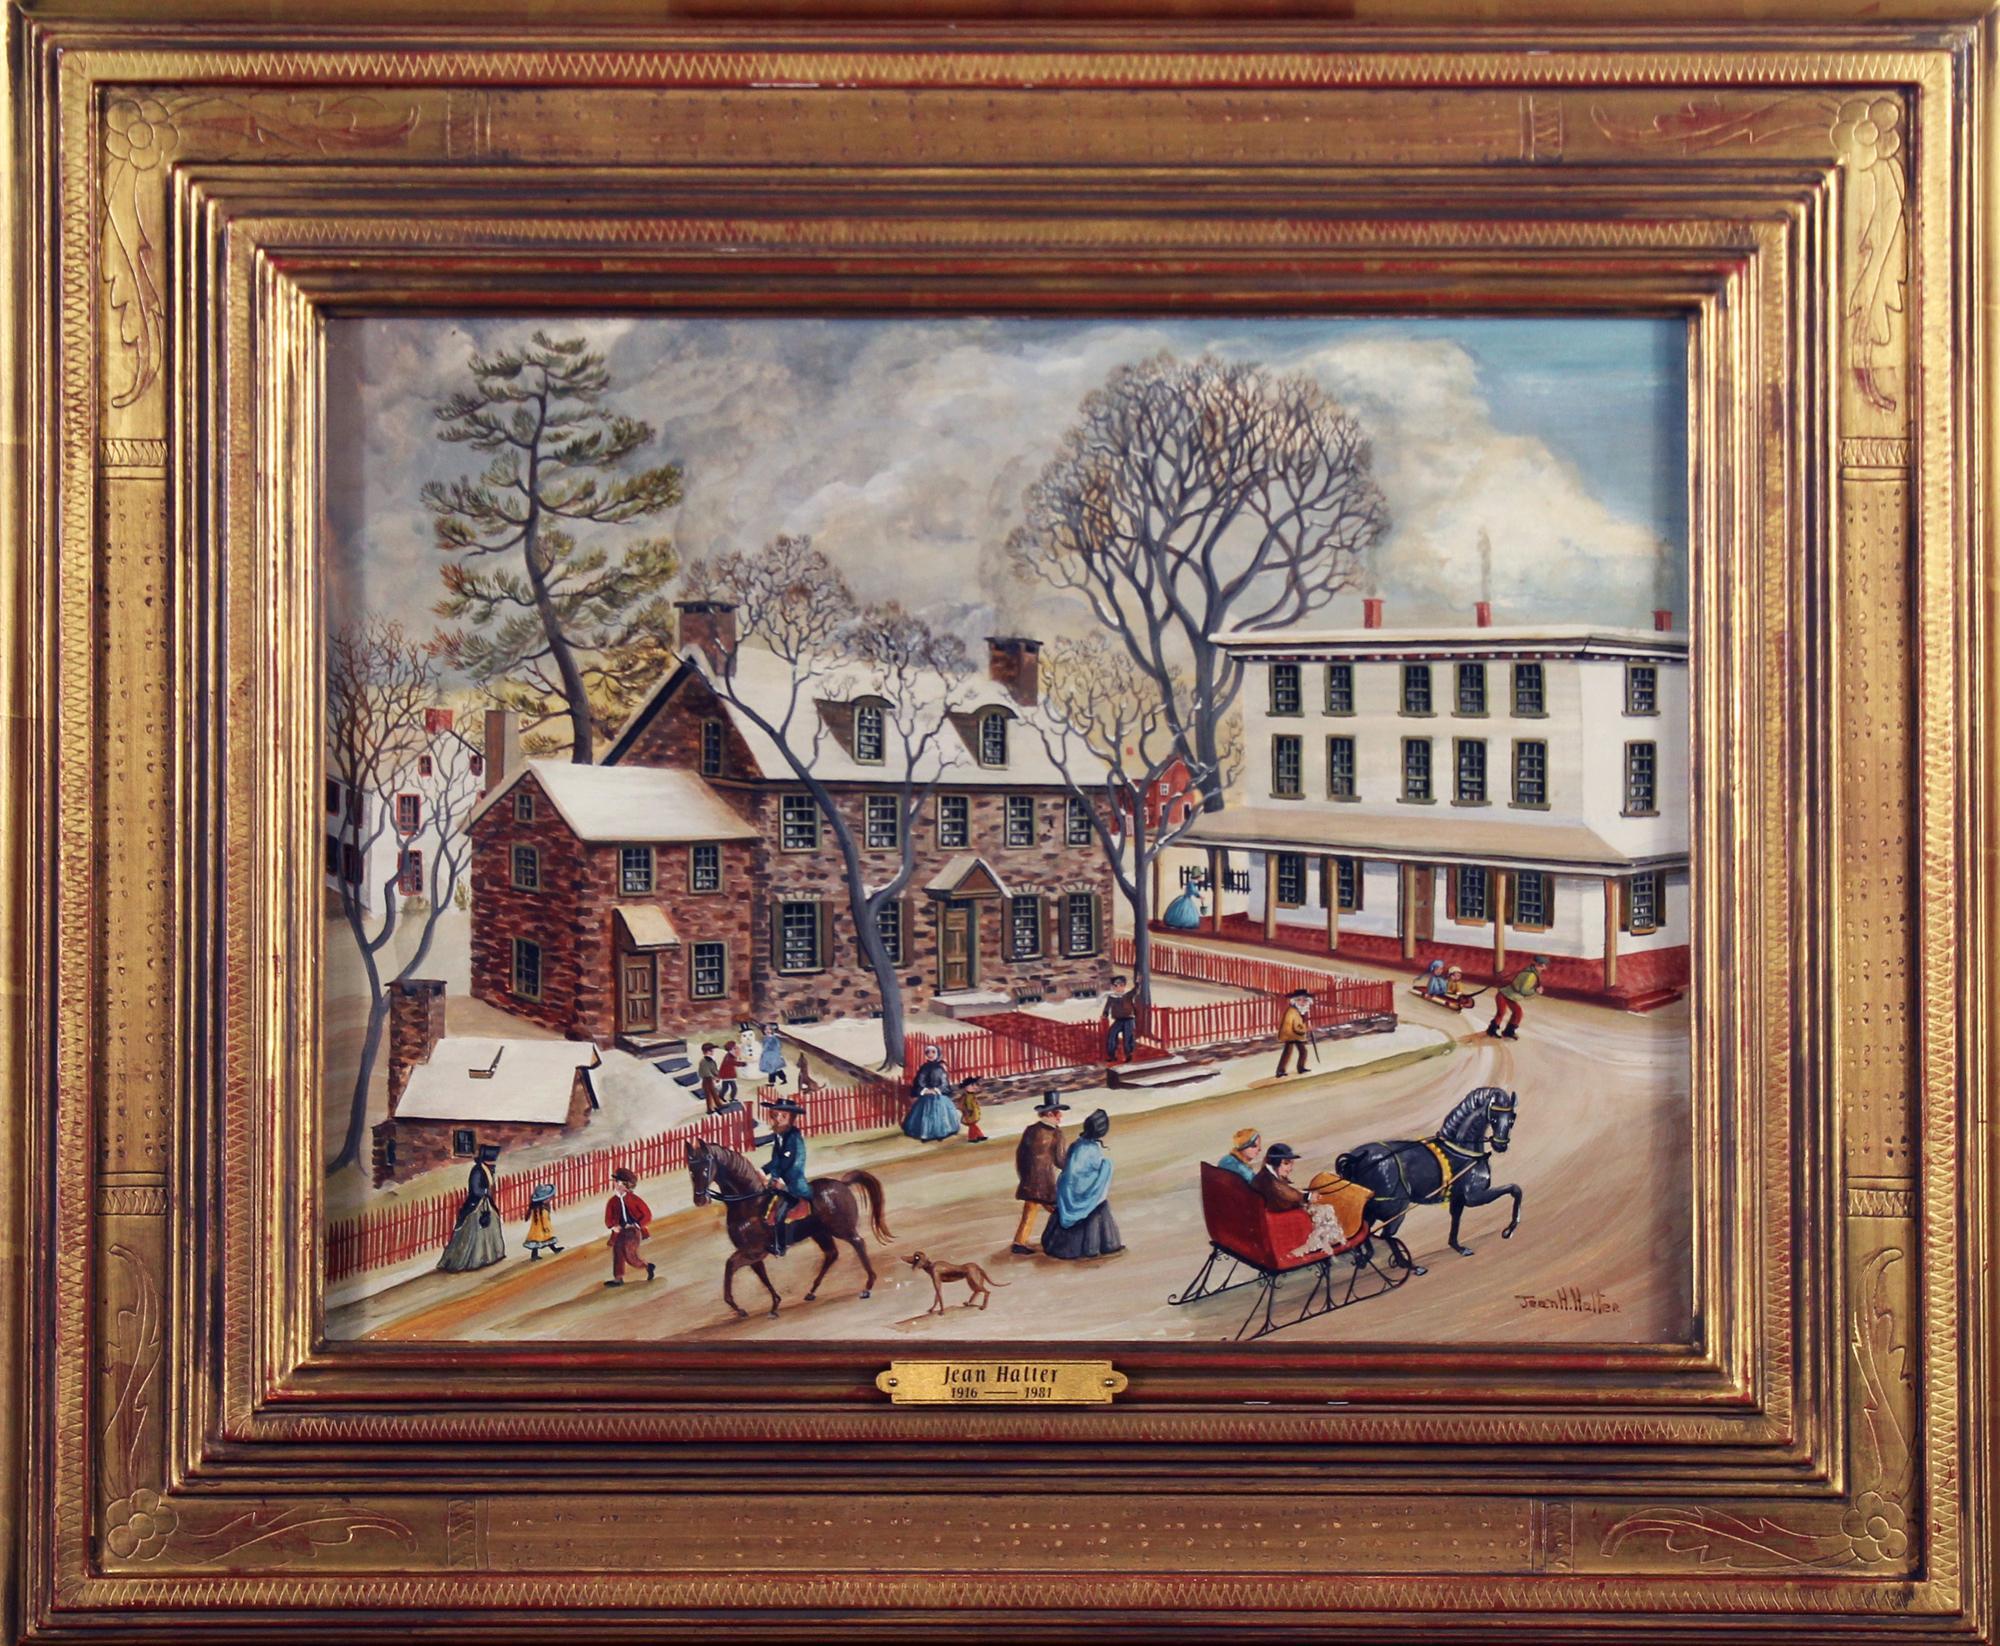 Parry Mansion, New Hope Pennsylvania, Folk Art, Regional American Town Scene